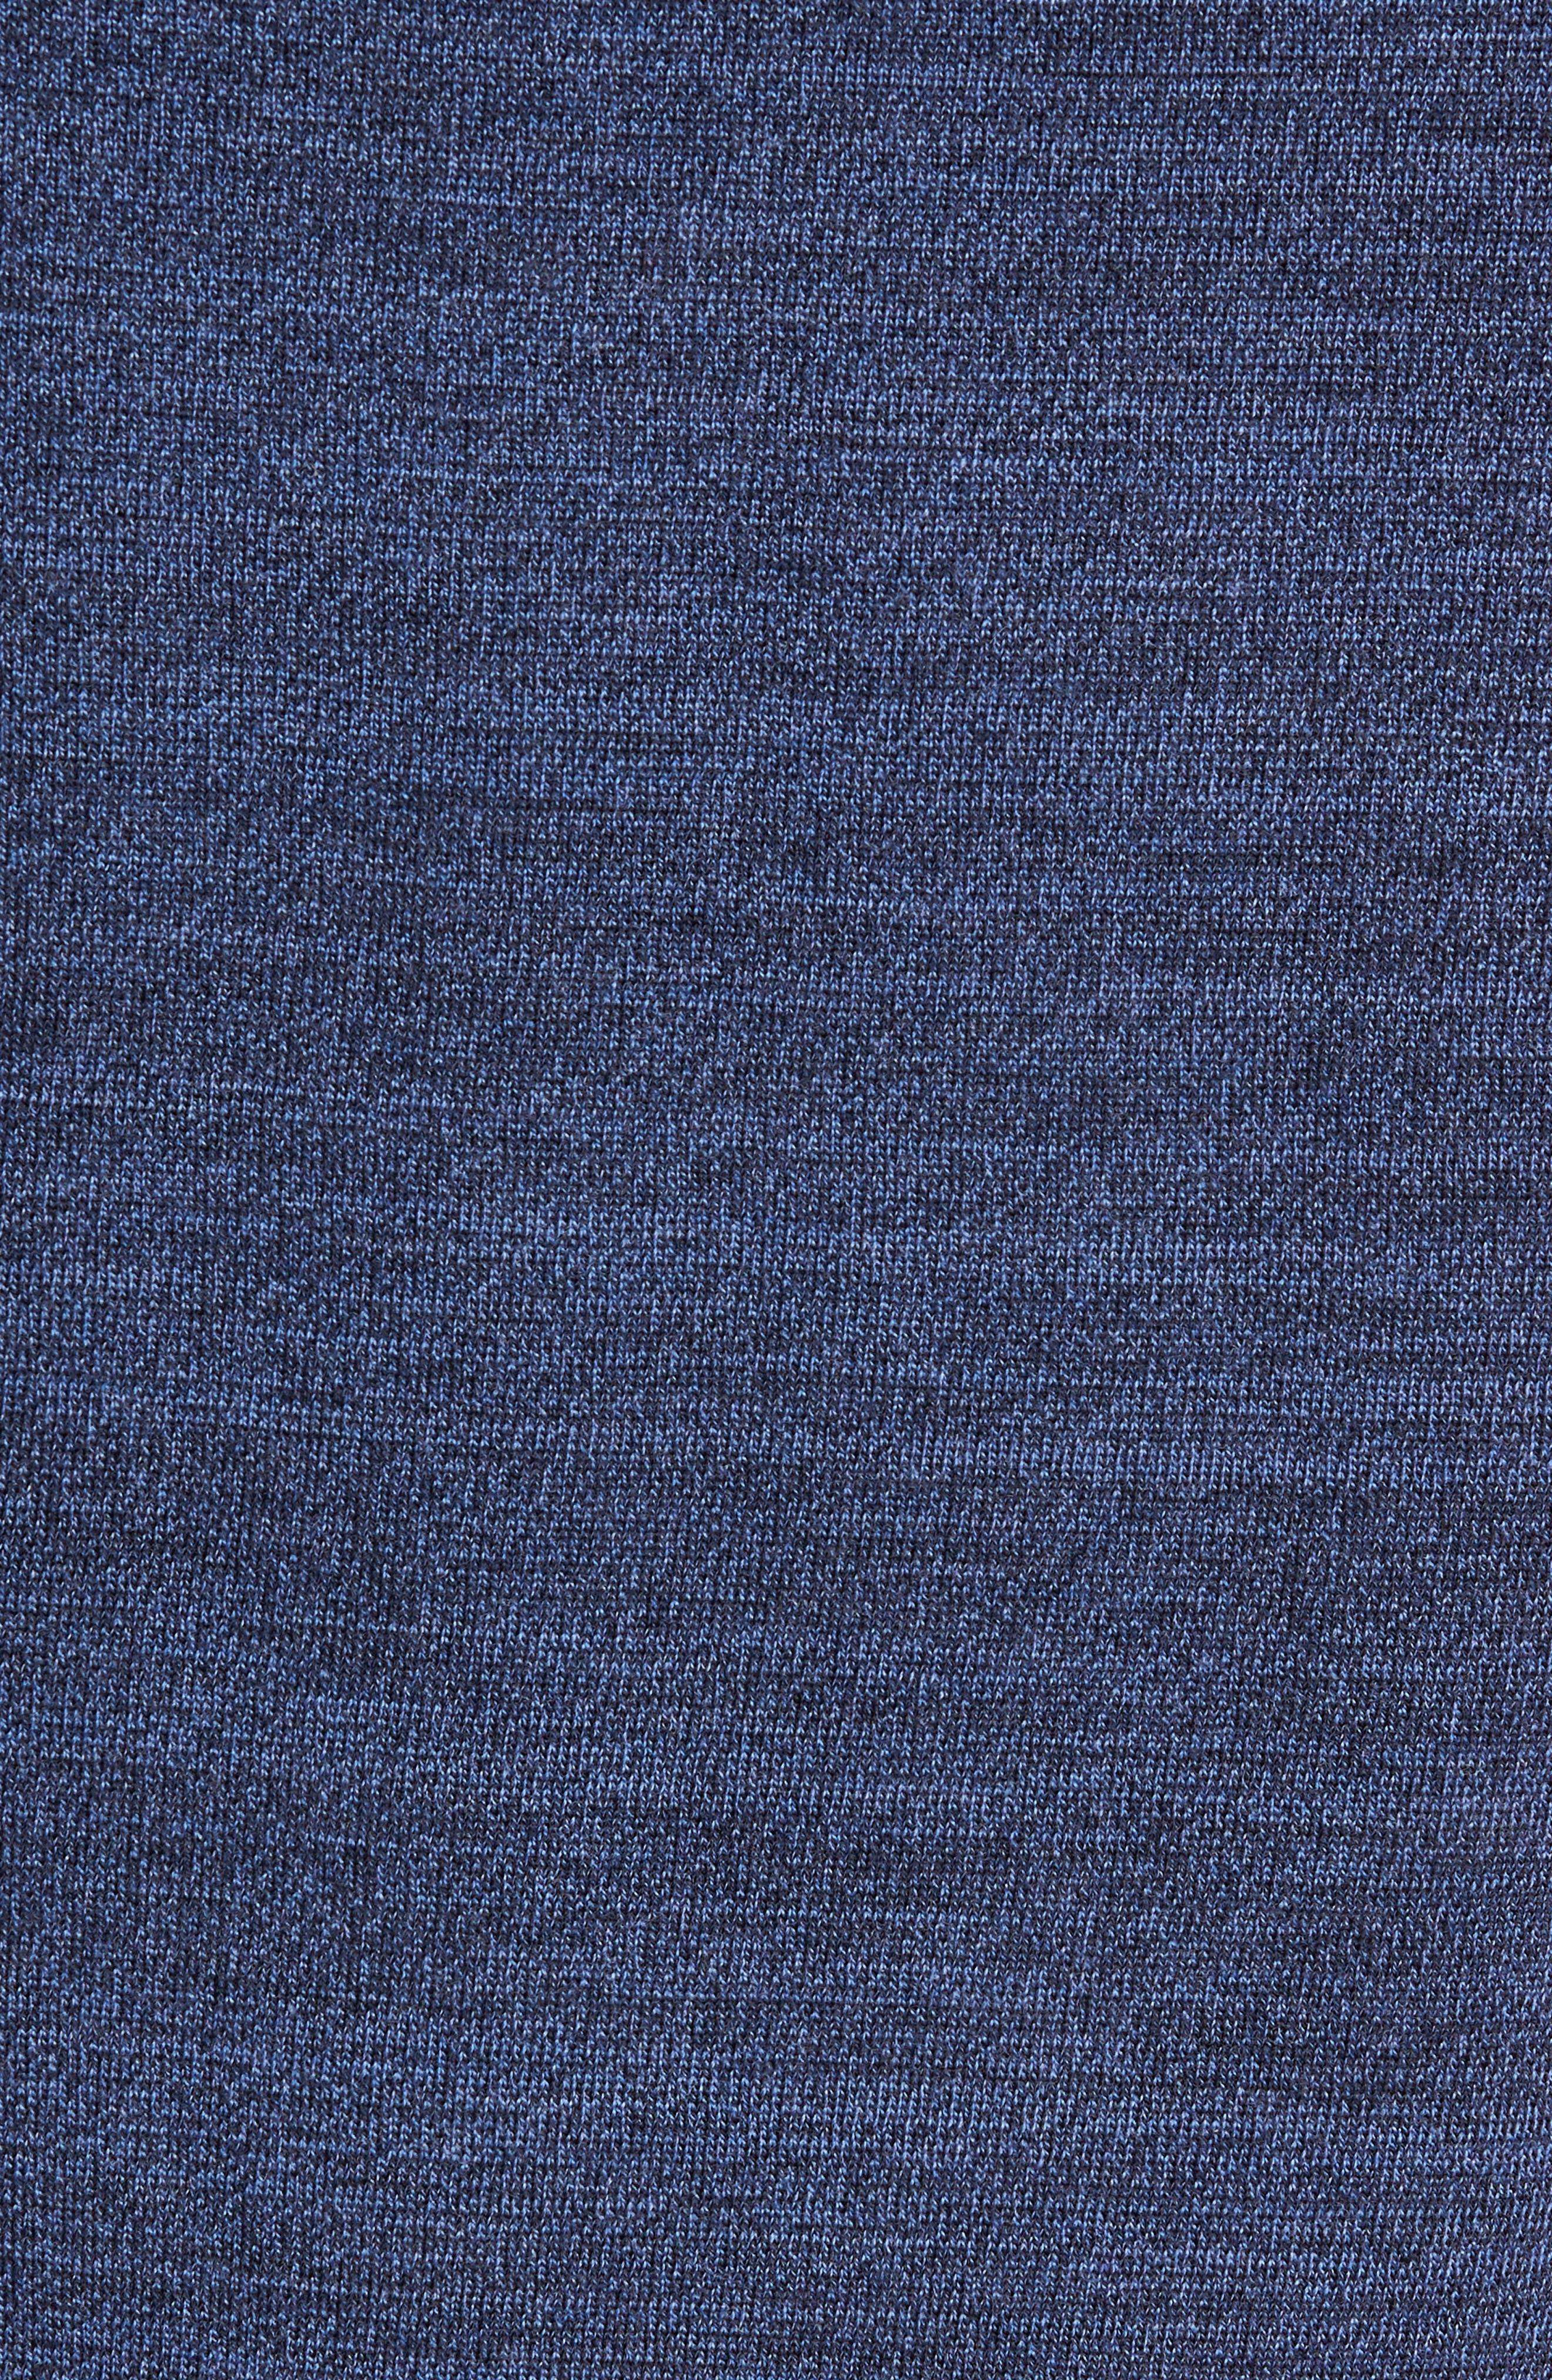 Intaria Star Merino Wool Sweater,                             Alternate thumbnail 5, color,                             BLUE